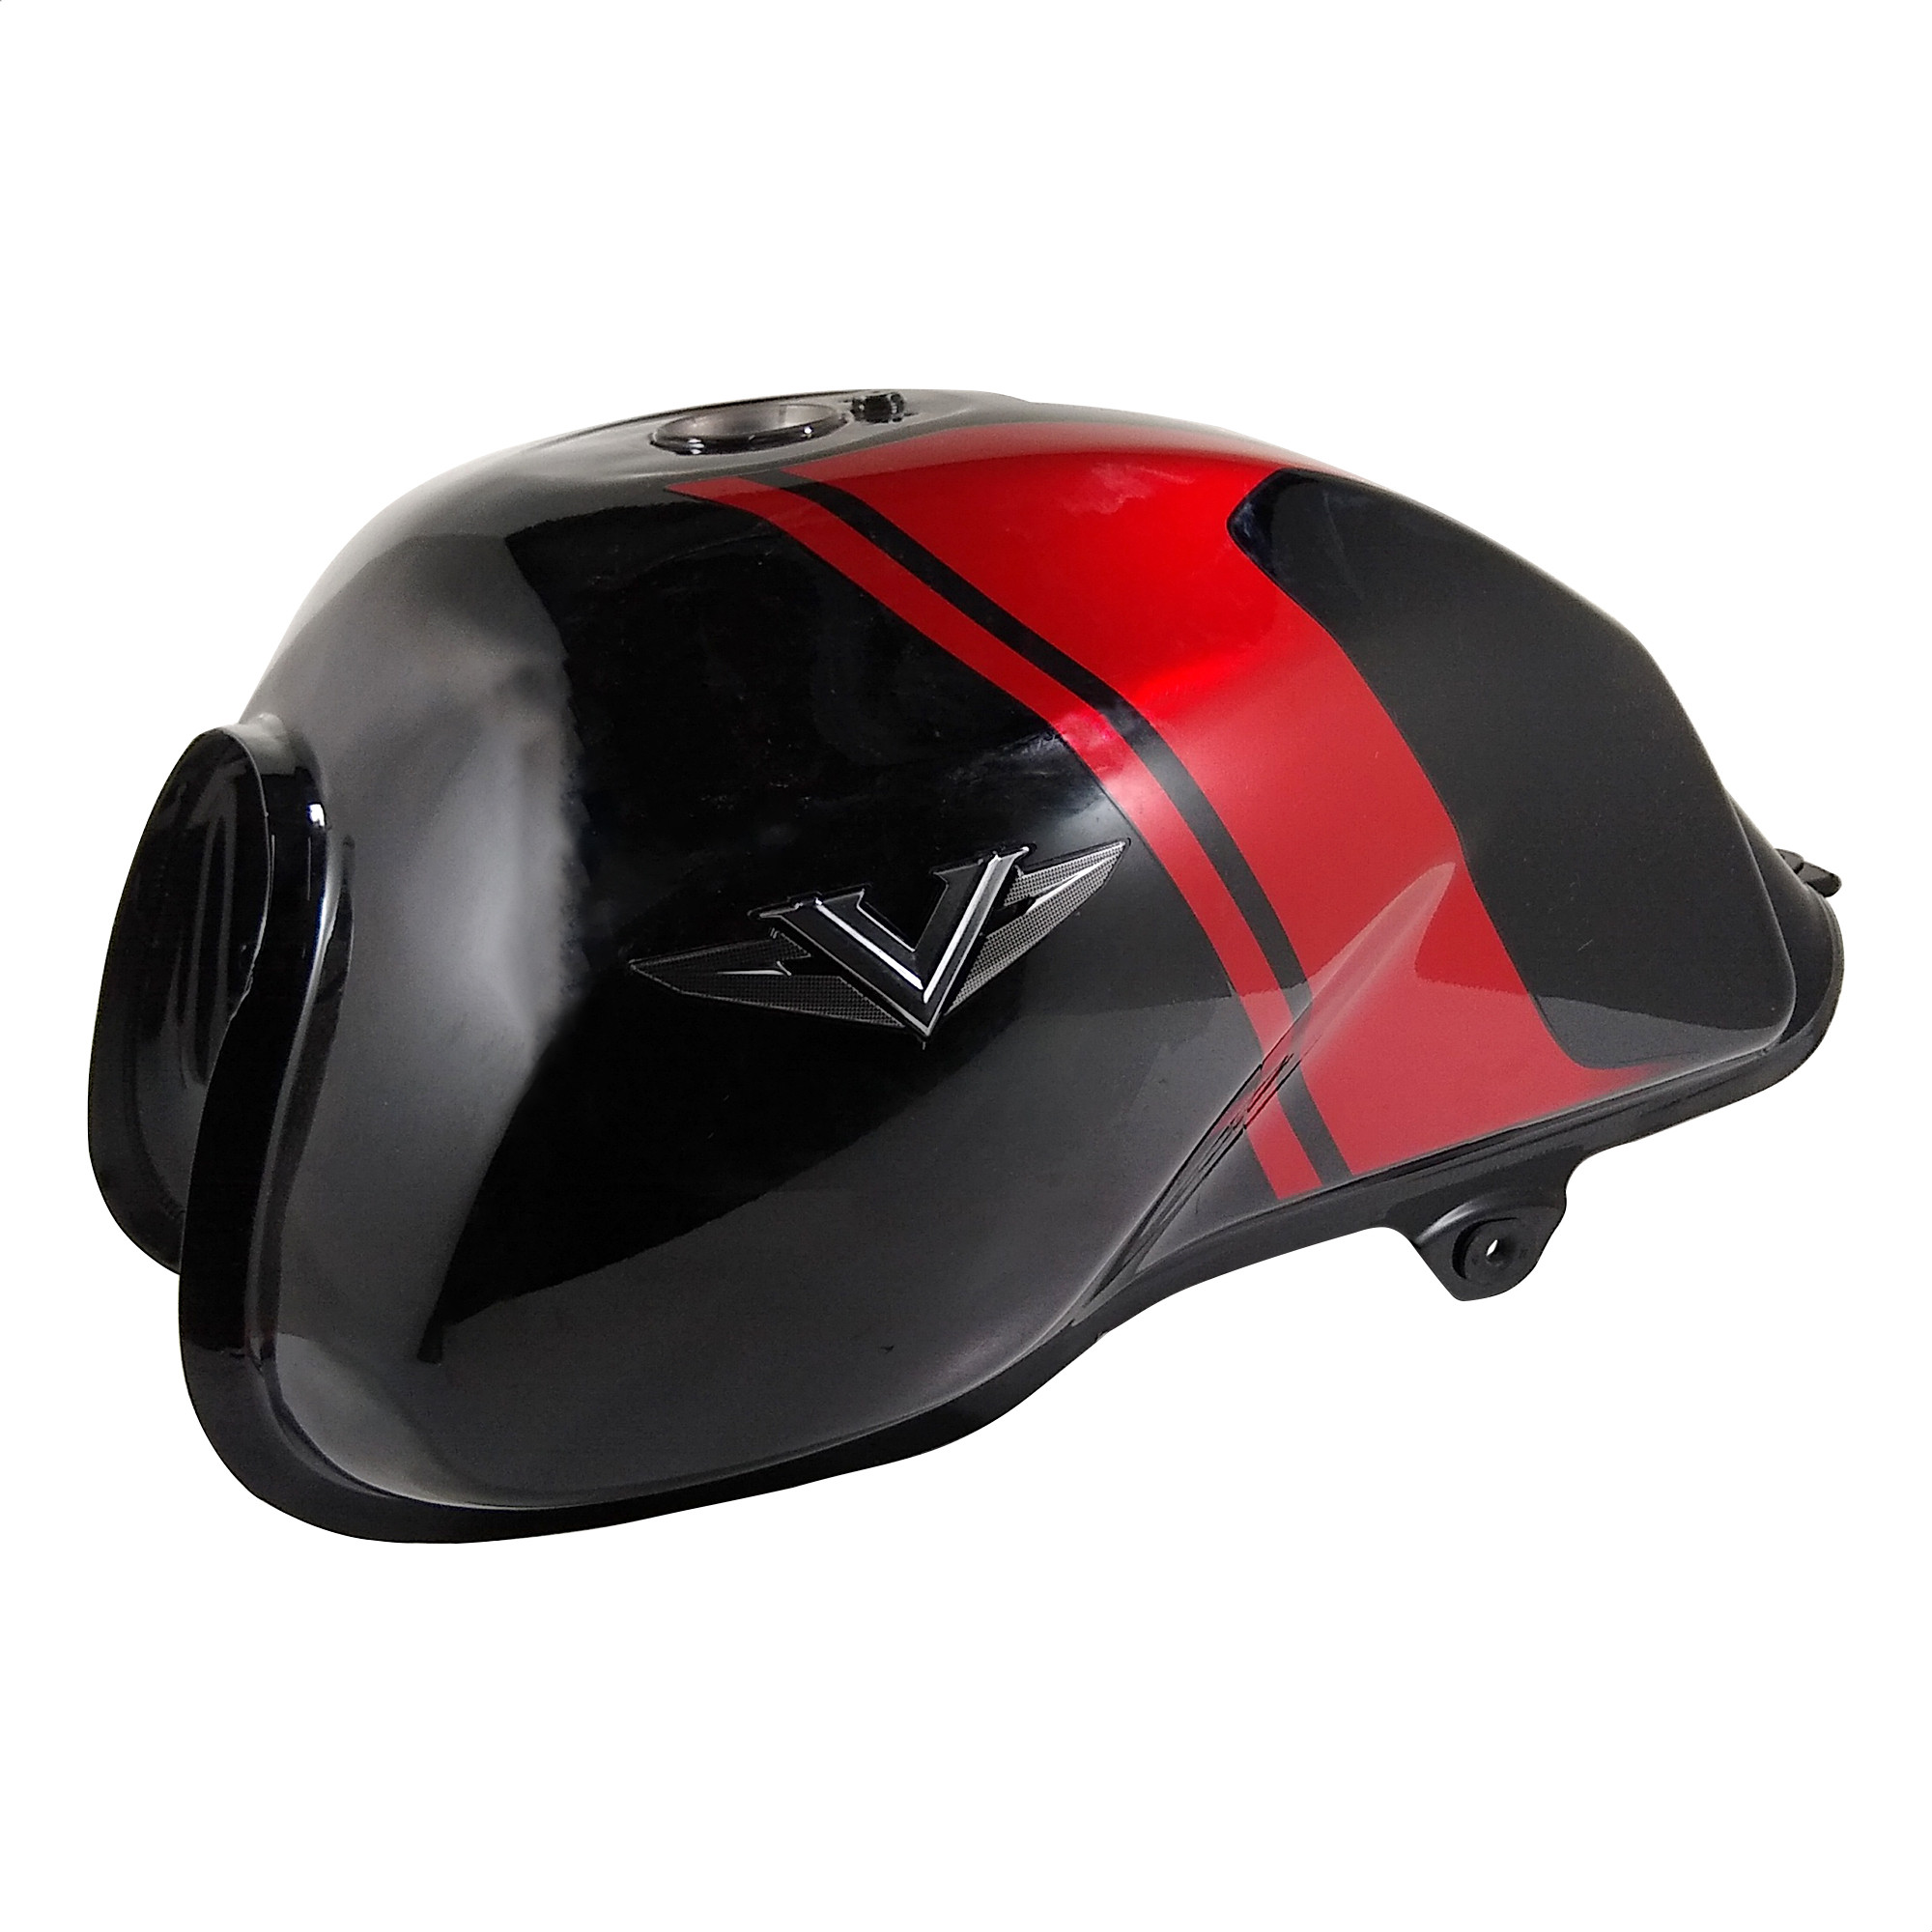 Tanque de Nafta Bajaj V15 Negro Rojo Original